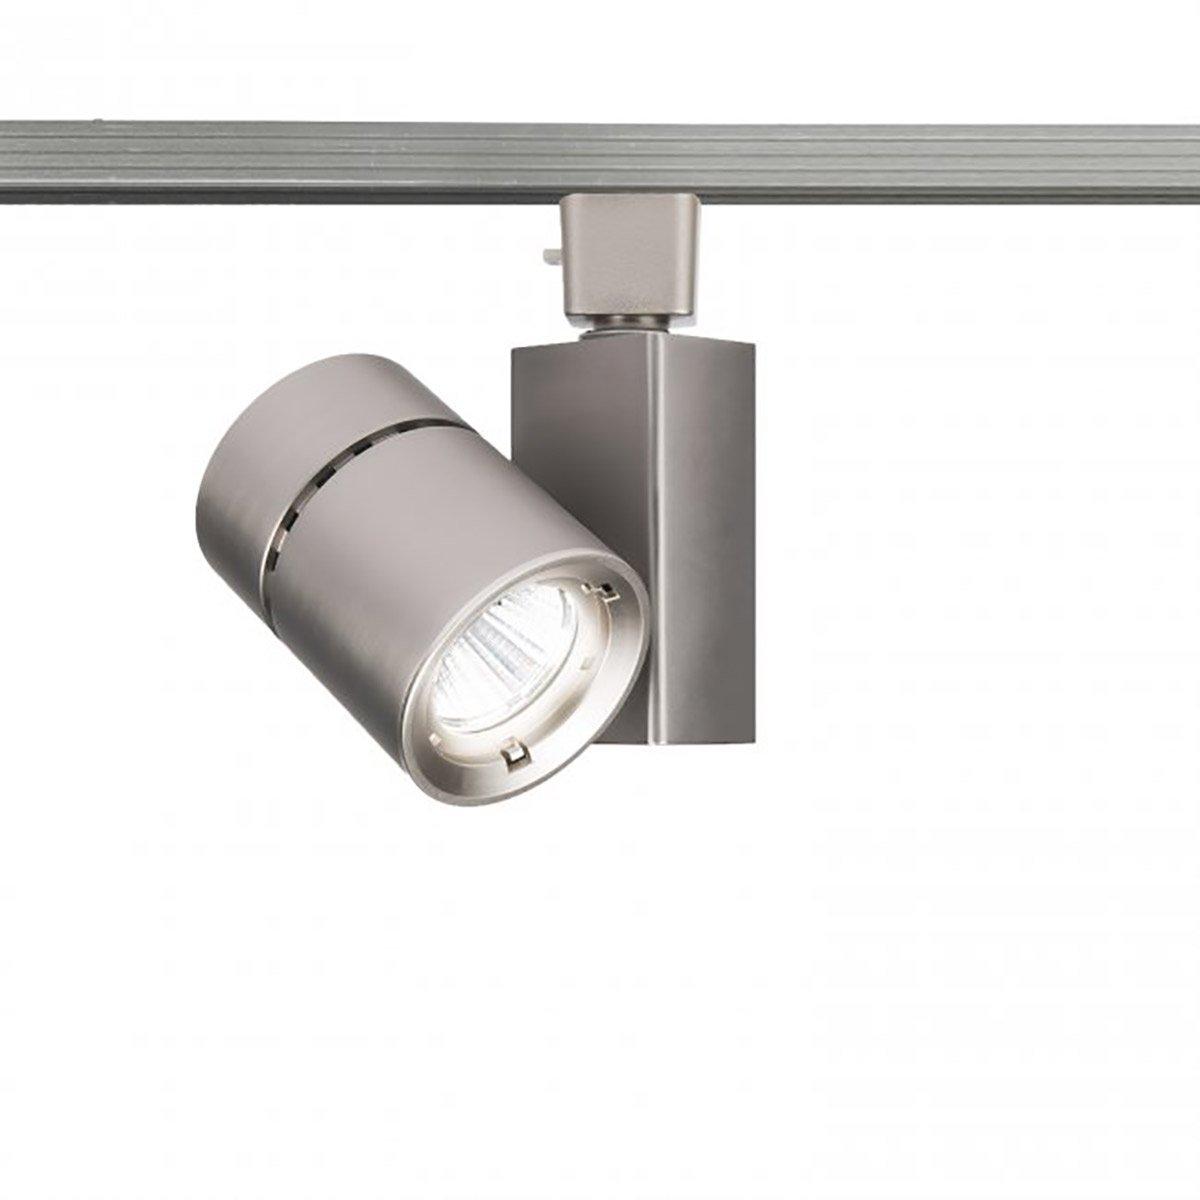 WAC Lighting J-1023N-830-BN J Series LED1023 Exterminator II LED Energy Star Track Head in Brushed Nickel Finish, Narrow Beam, 3000K